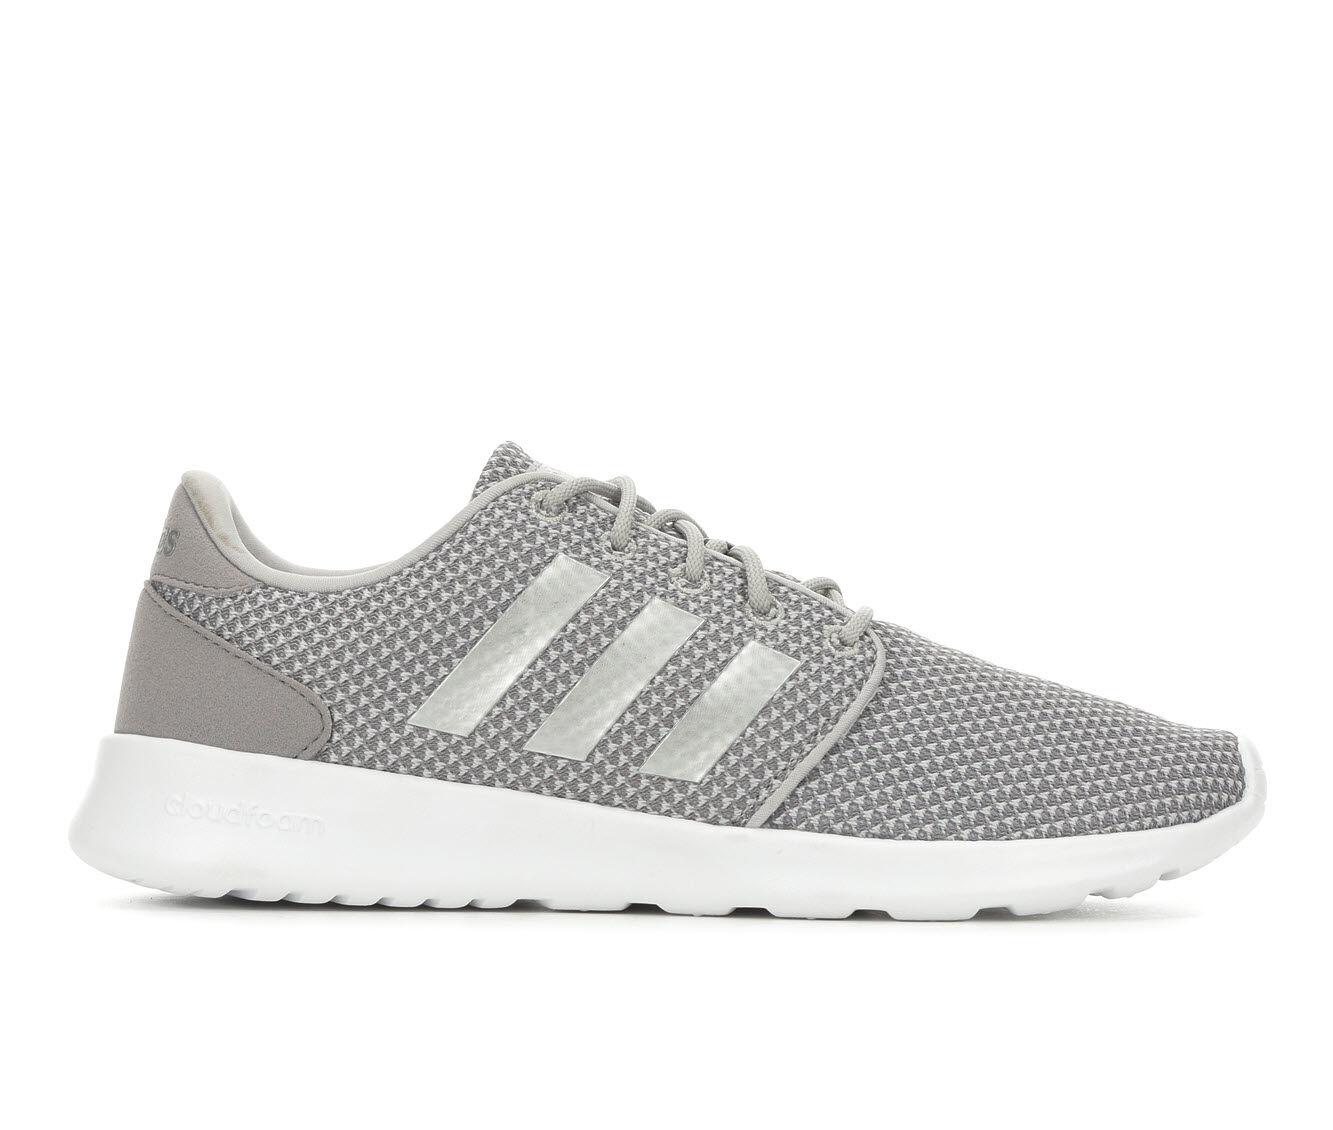 Buy Popular Women's Adidas Cloudfoam QT Racer Sneakers Grey/Silver